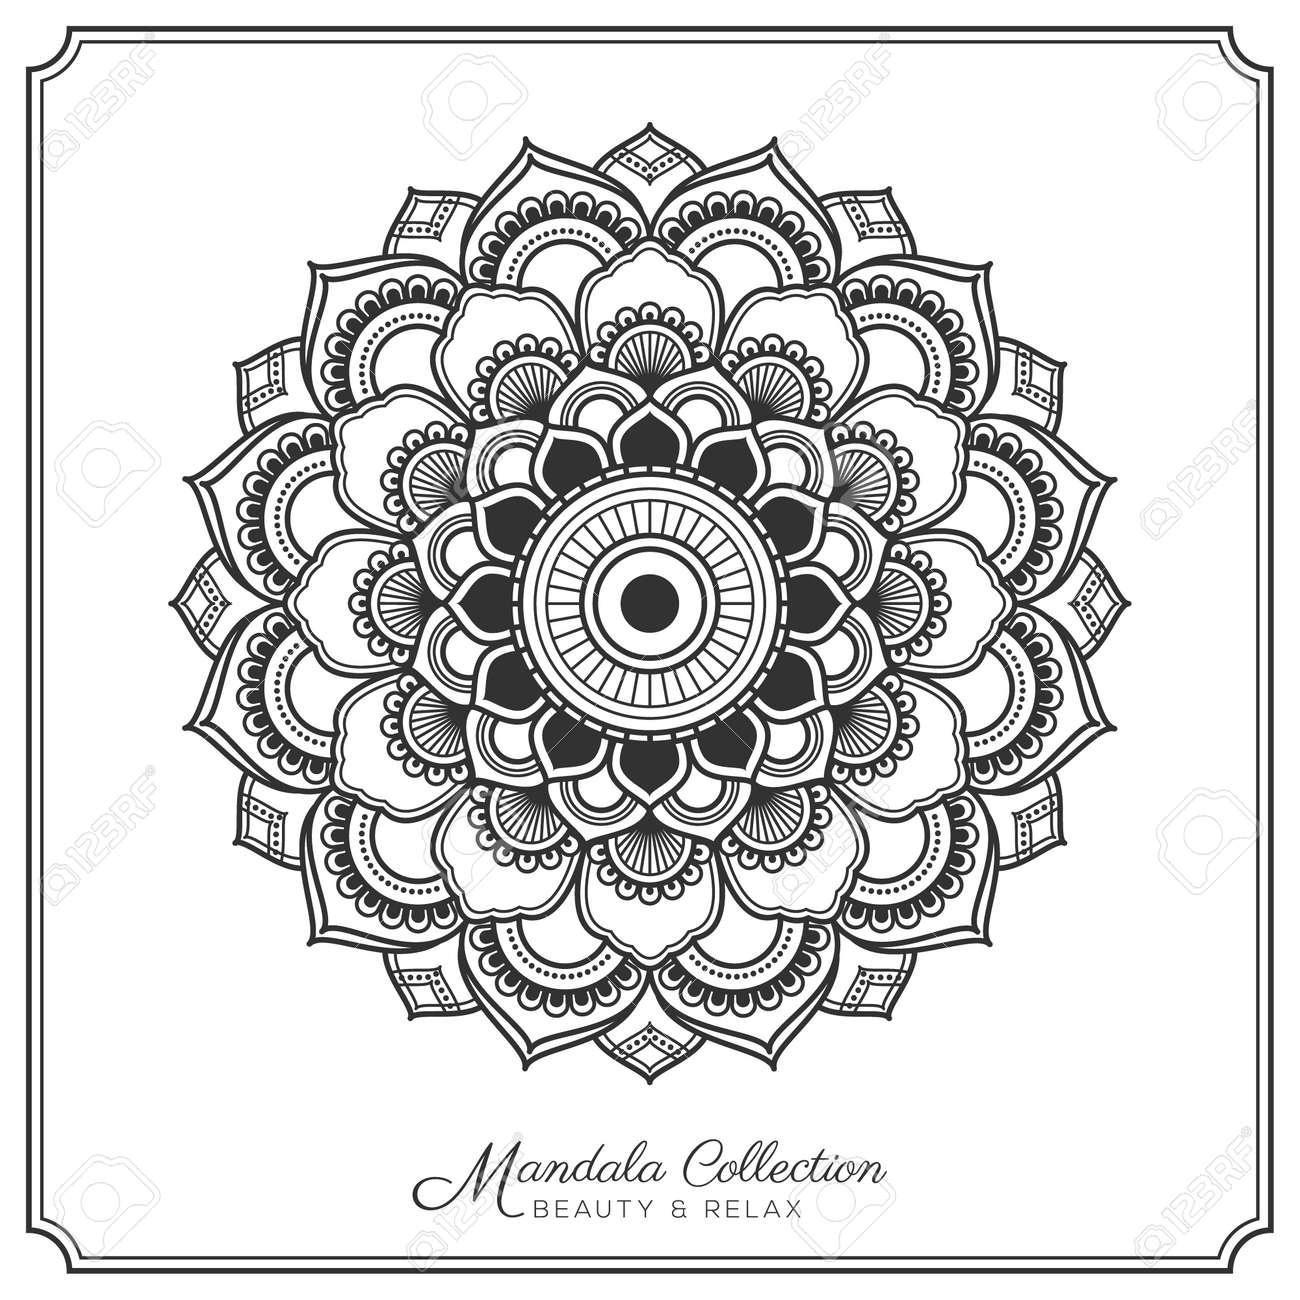 Mandala Decorative Ornament Design For Coloring Page Greeting